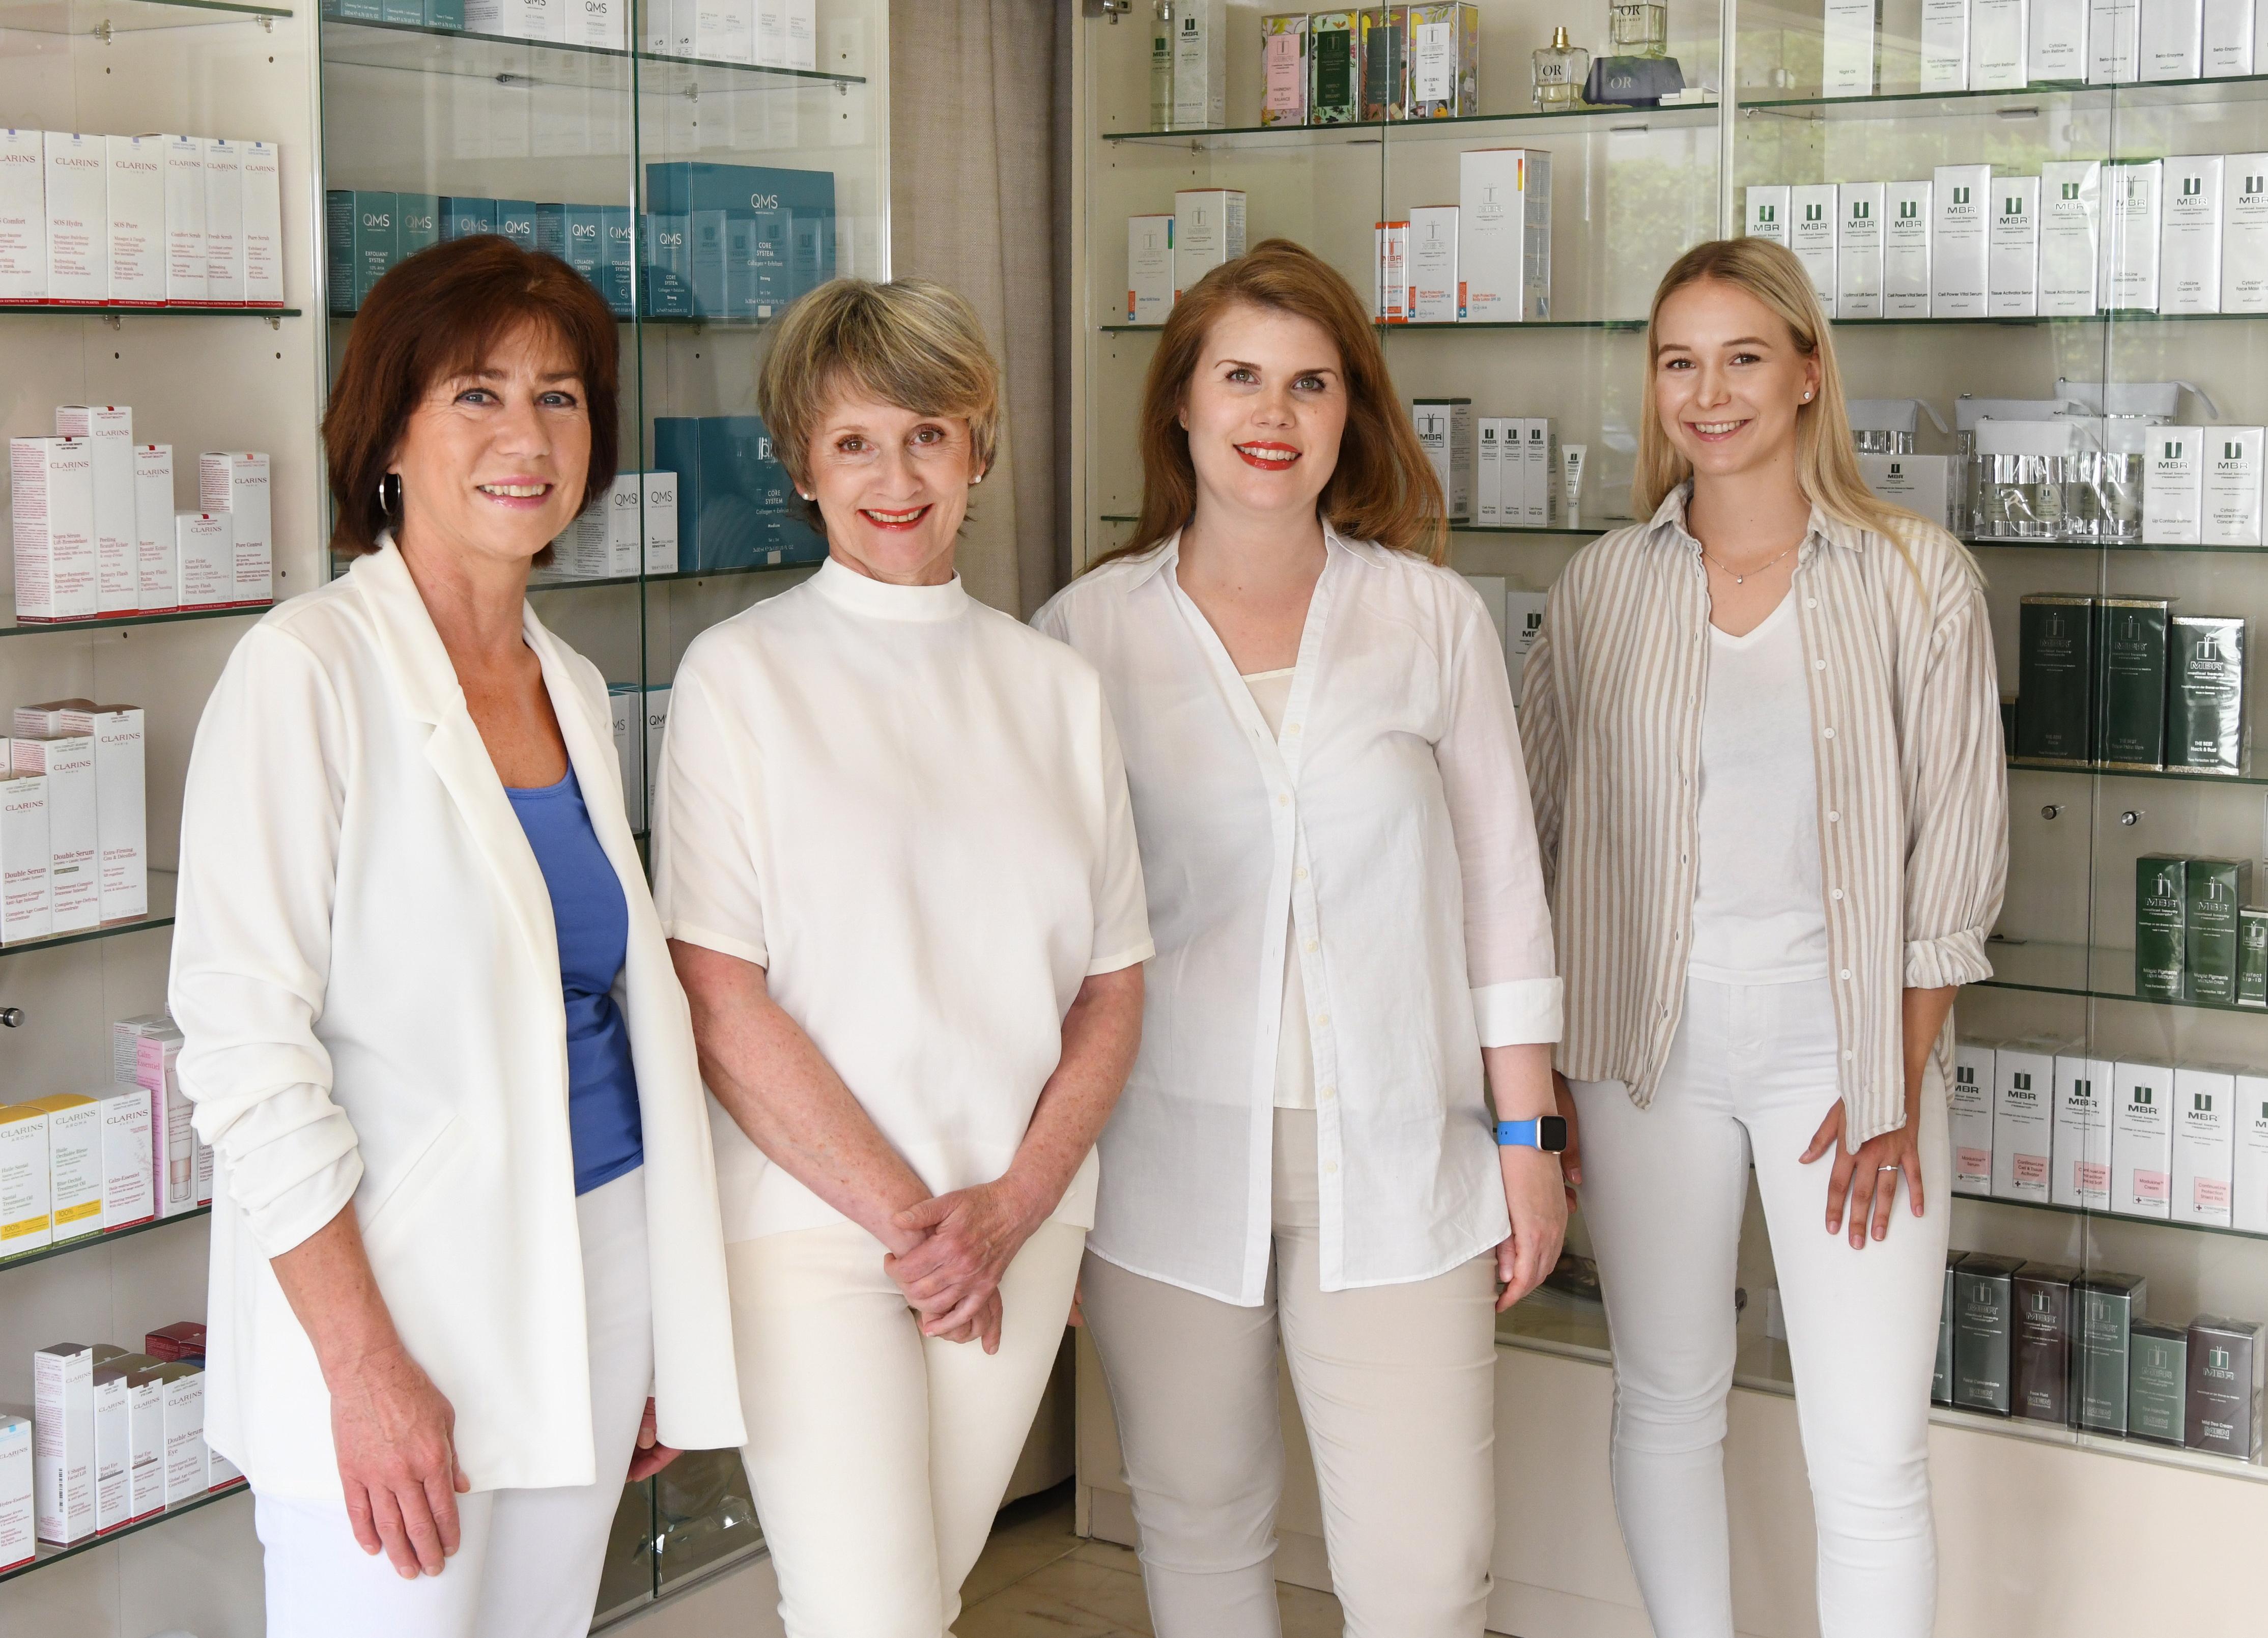 Team LIANE BOTT - Kosmetische Behandlungen Stuttgart Degerloch